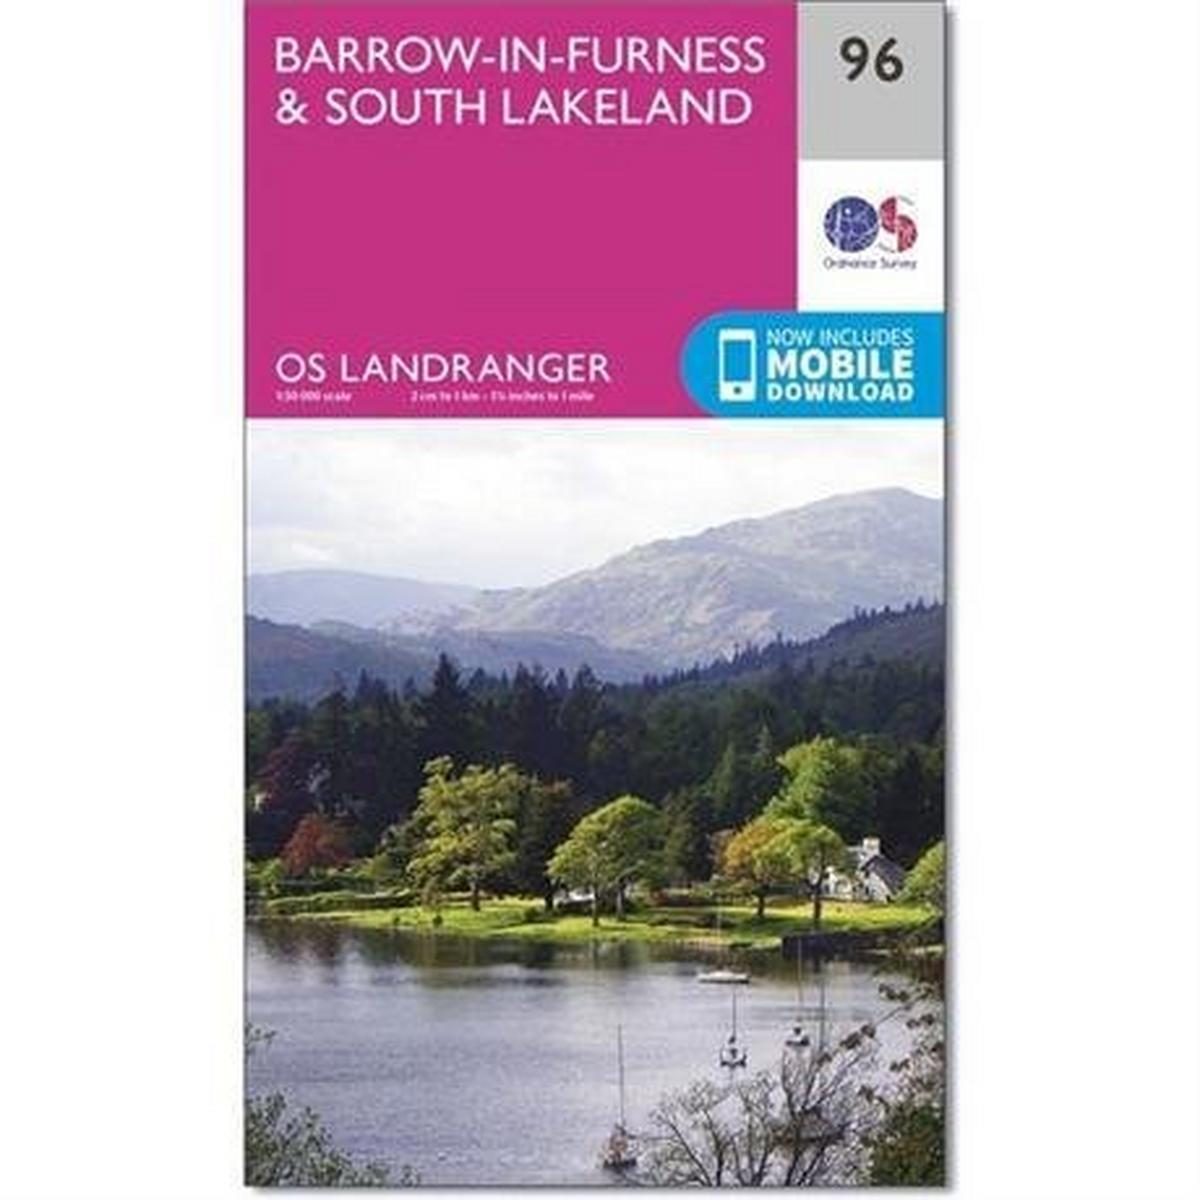 Ordnance Survey OS Landranger Map 96 Barrow-in-Furness & South Lakeland